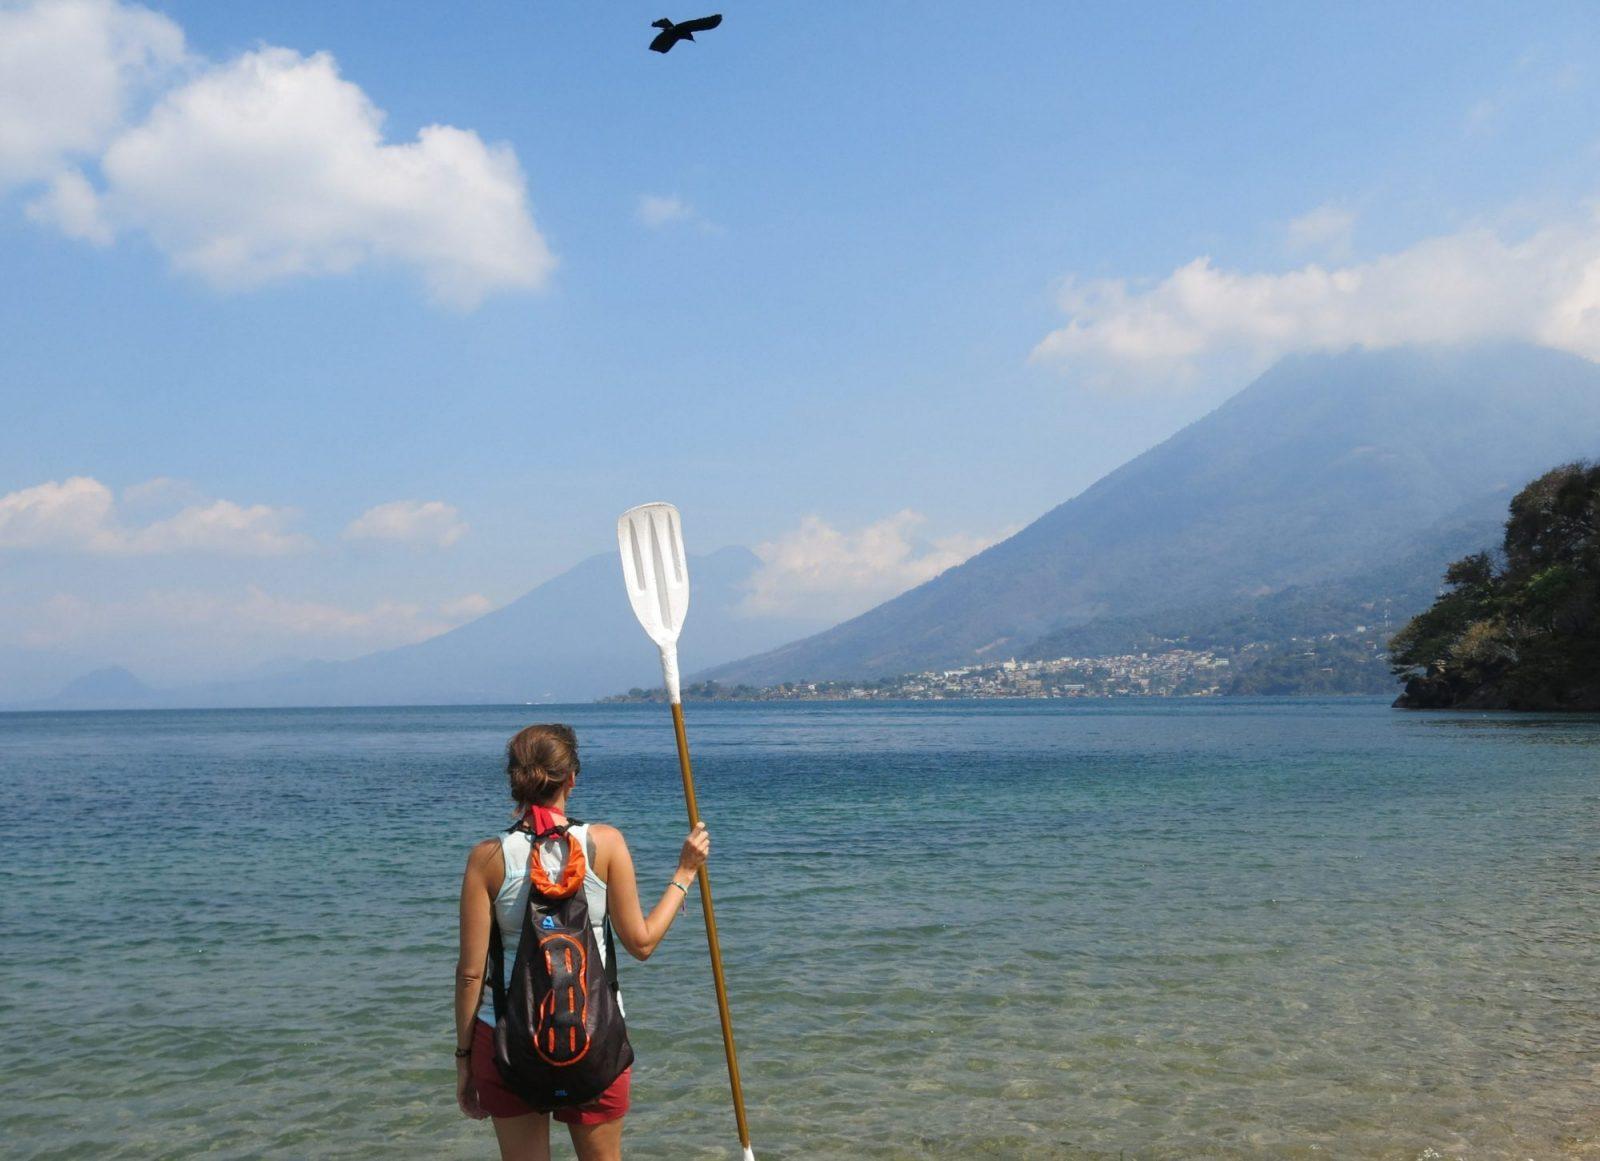 backpacking Guatemala, travel tips for female travelers